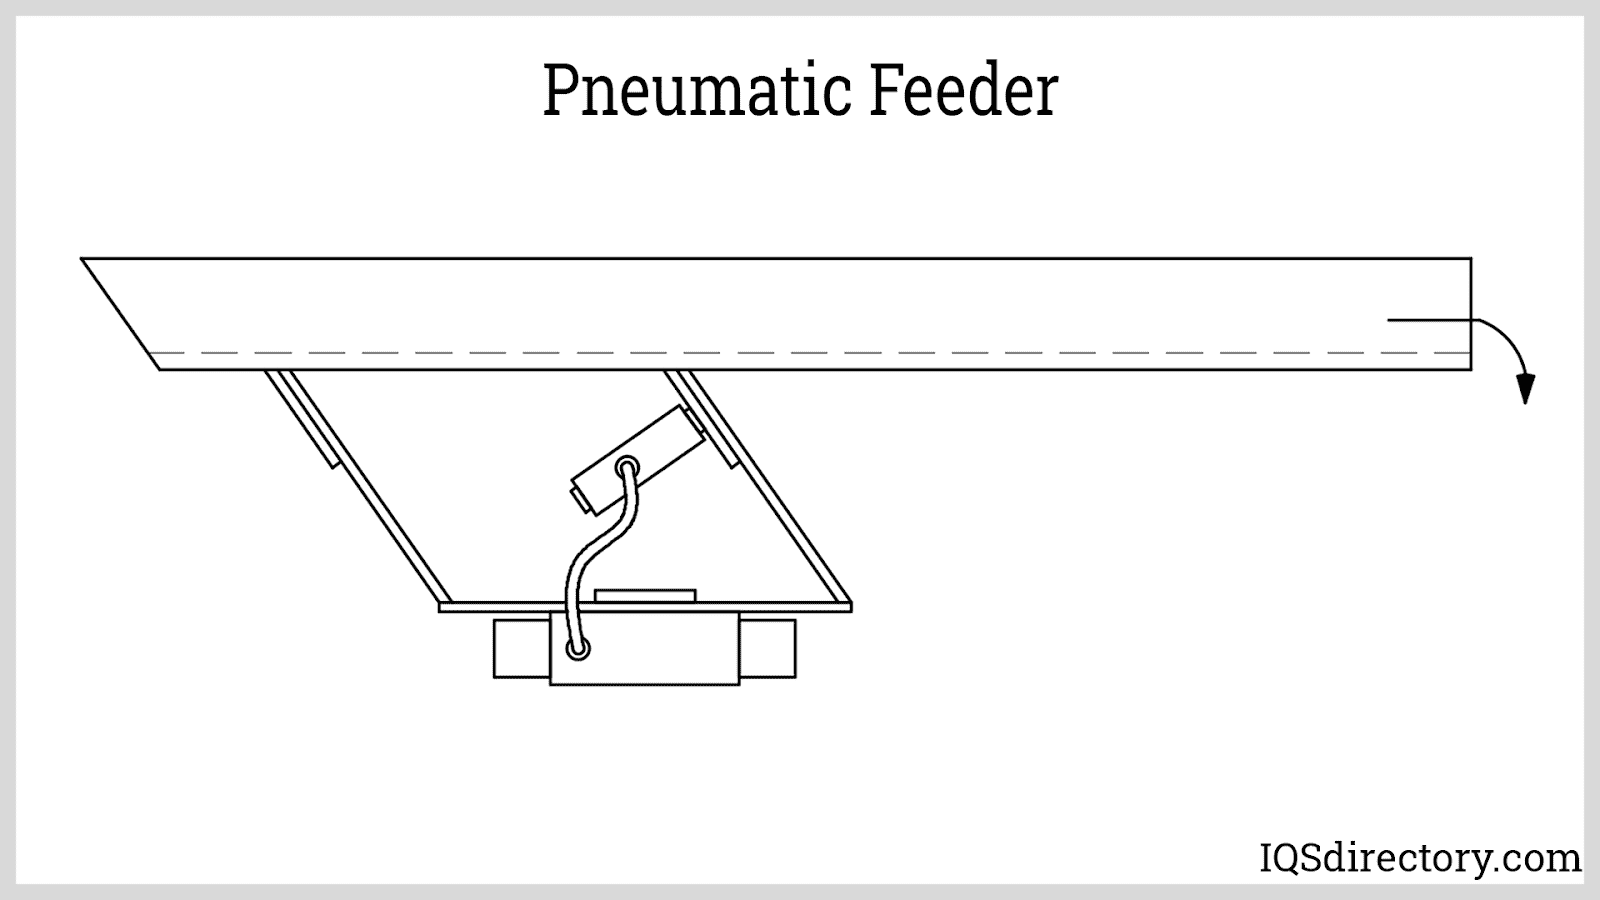 Pneumatic Feeder